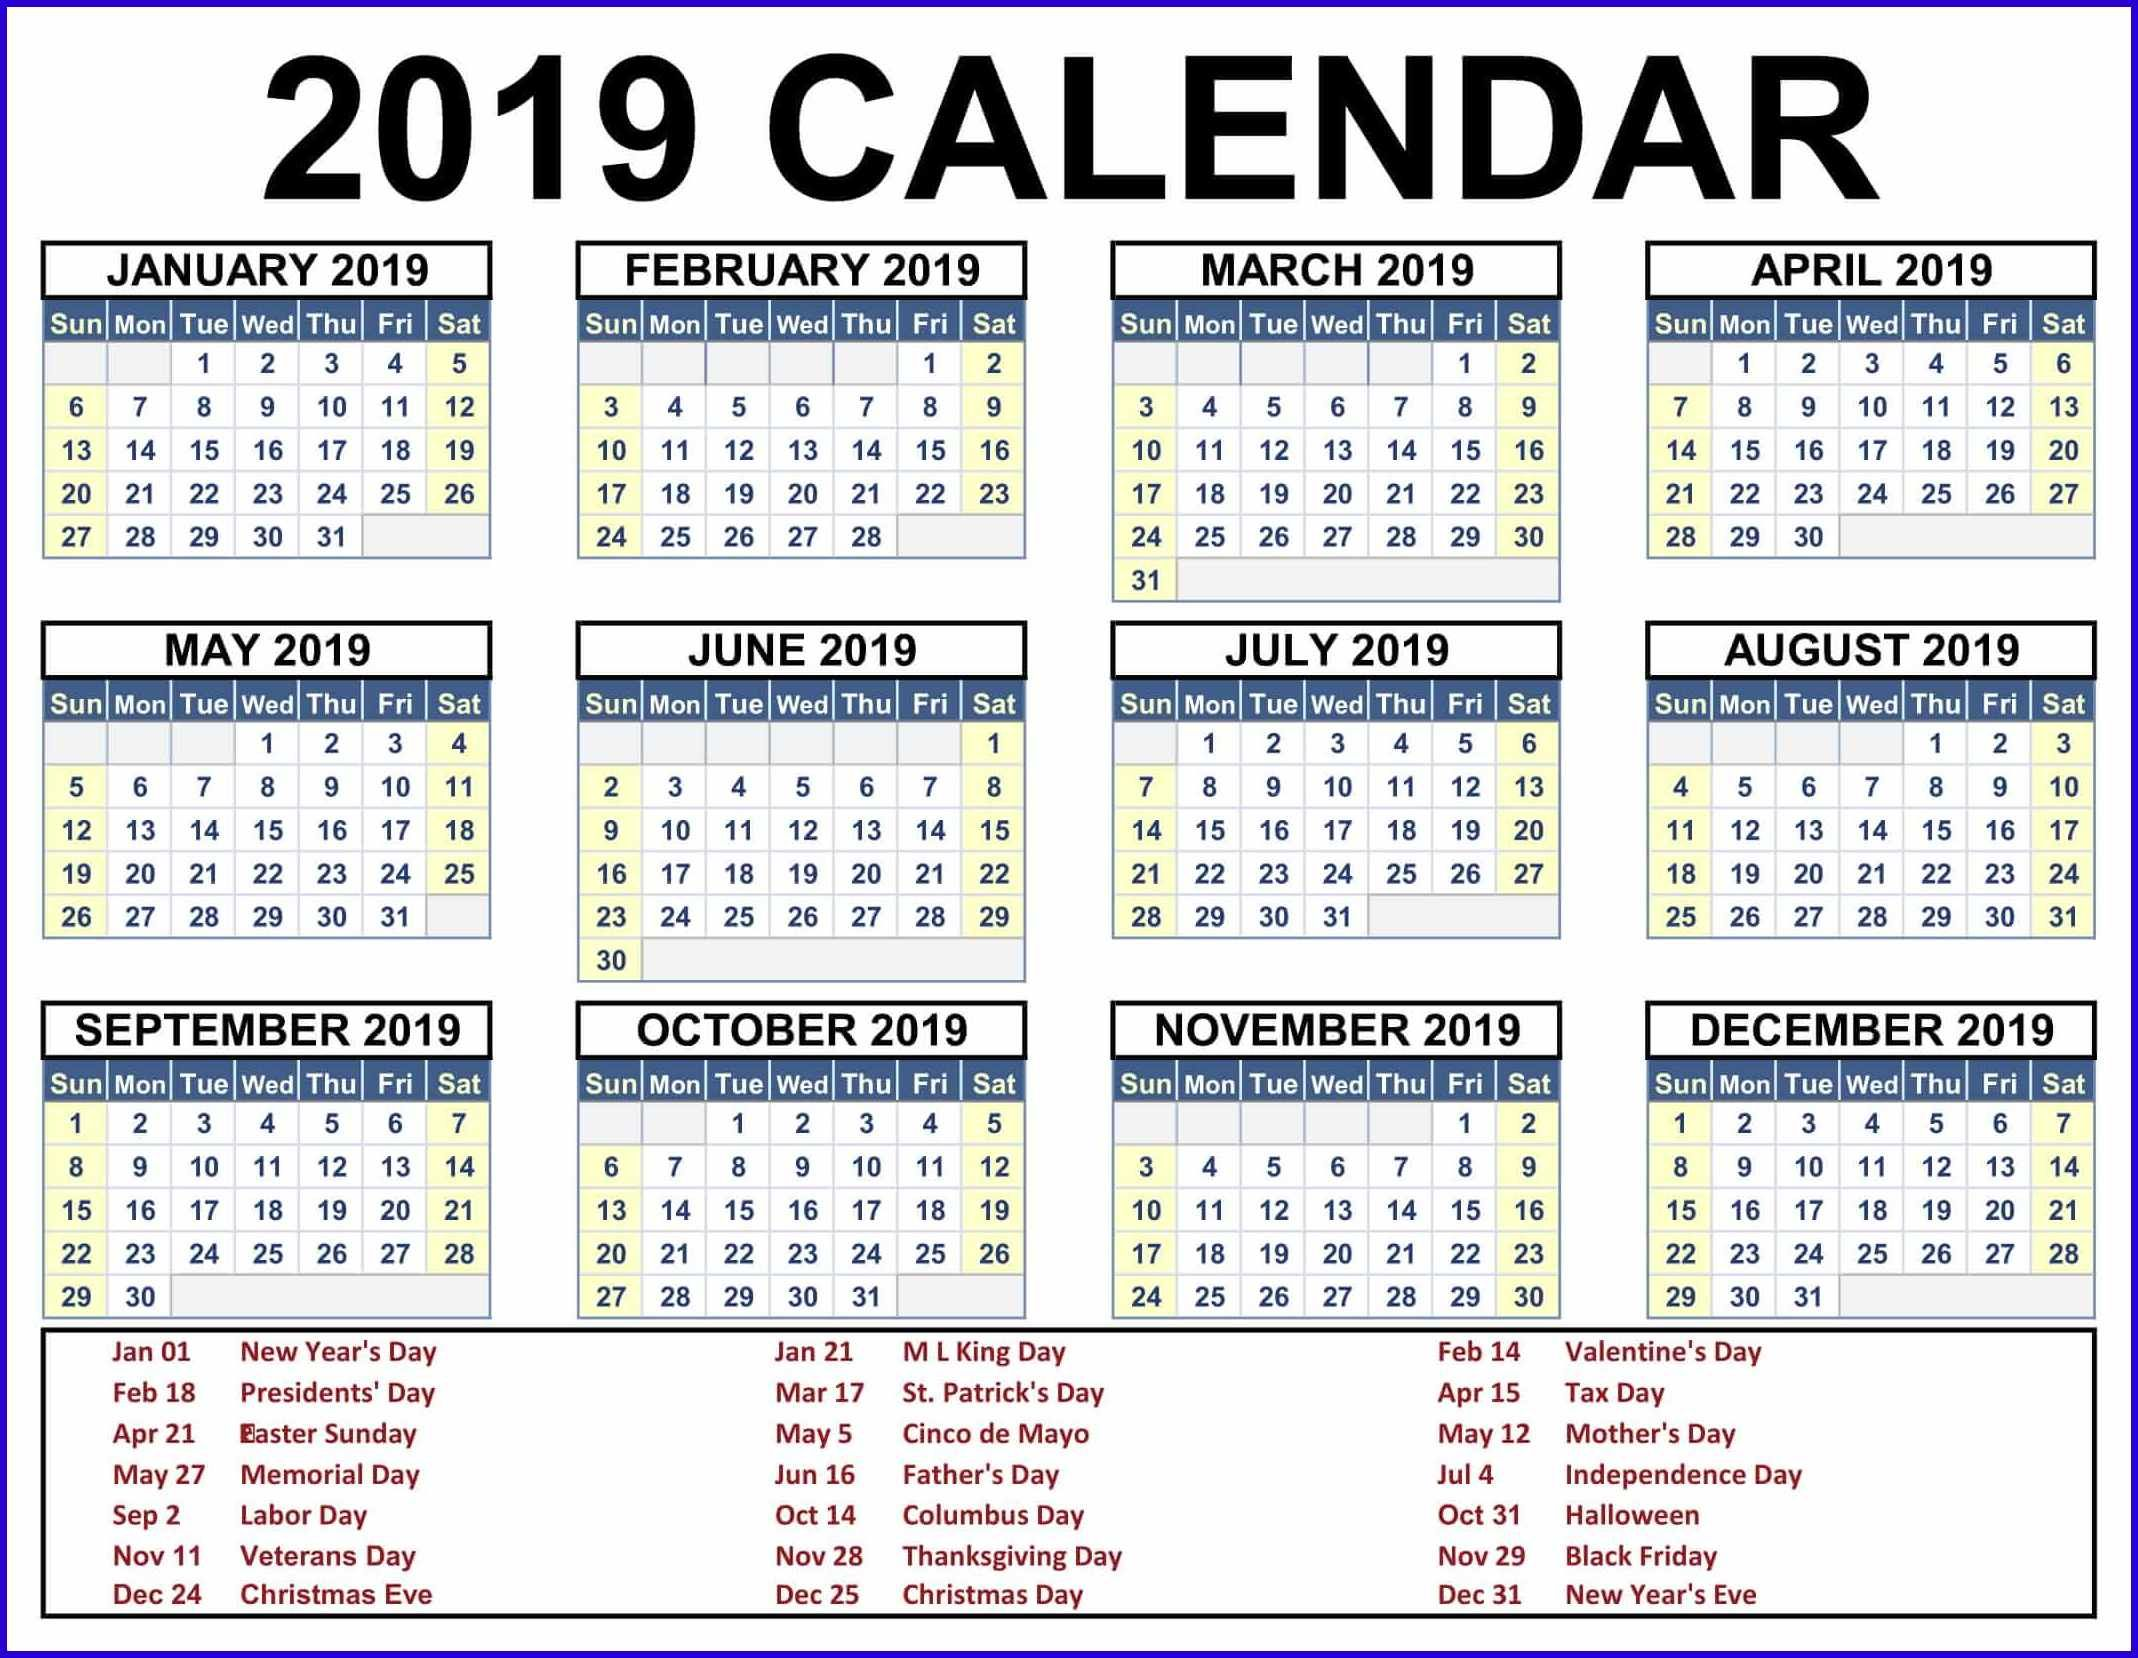 2019 Business Calendar Template With Holidays Calendar 2019